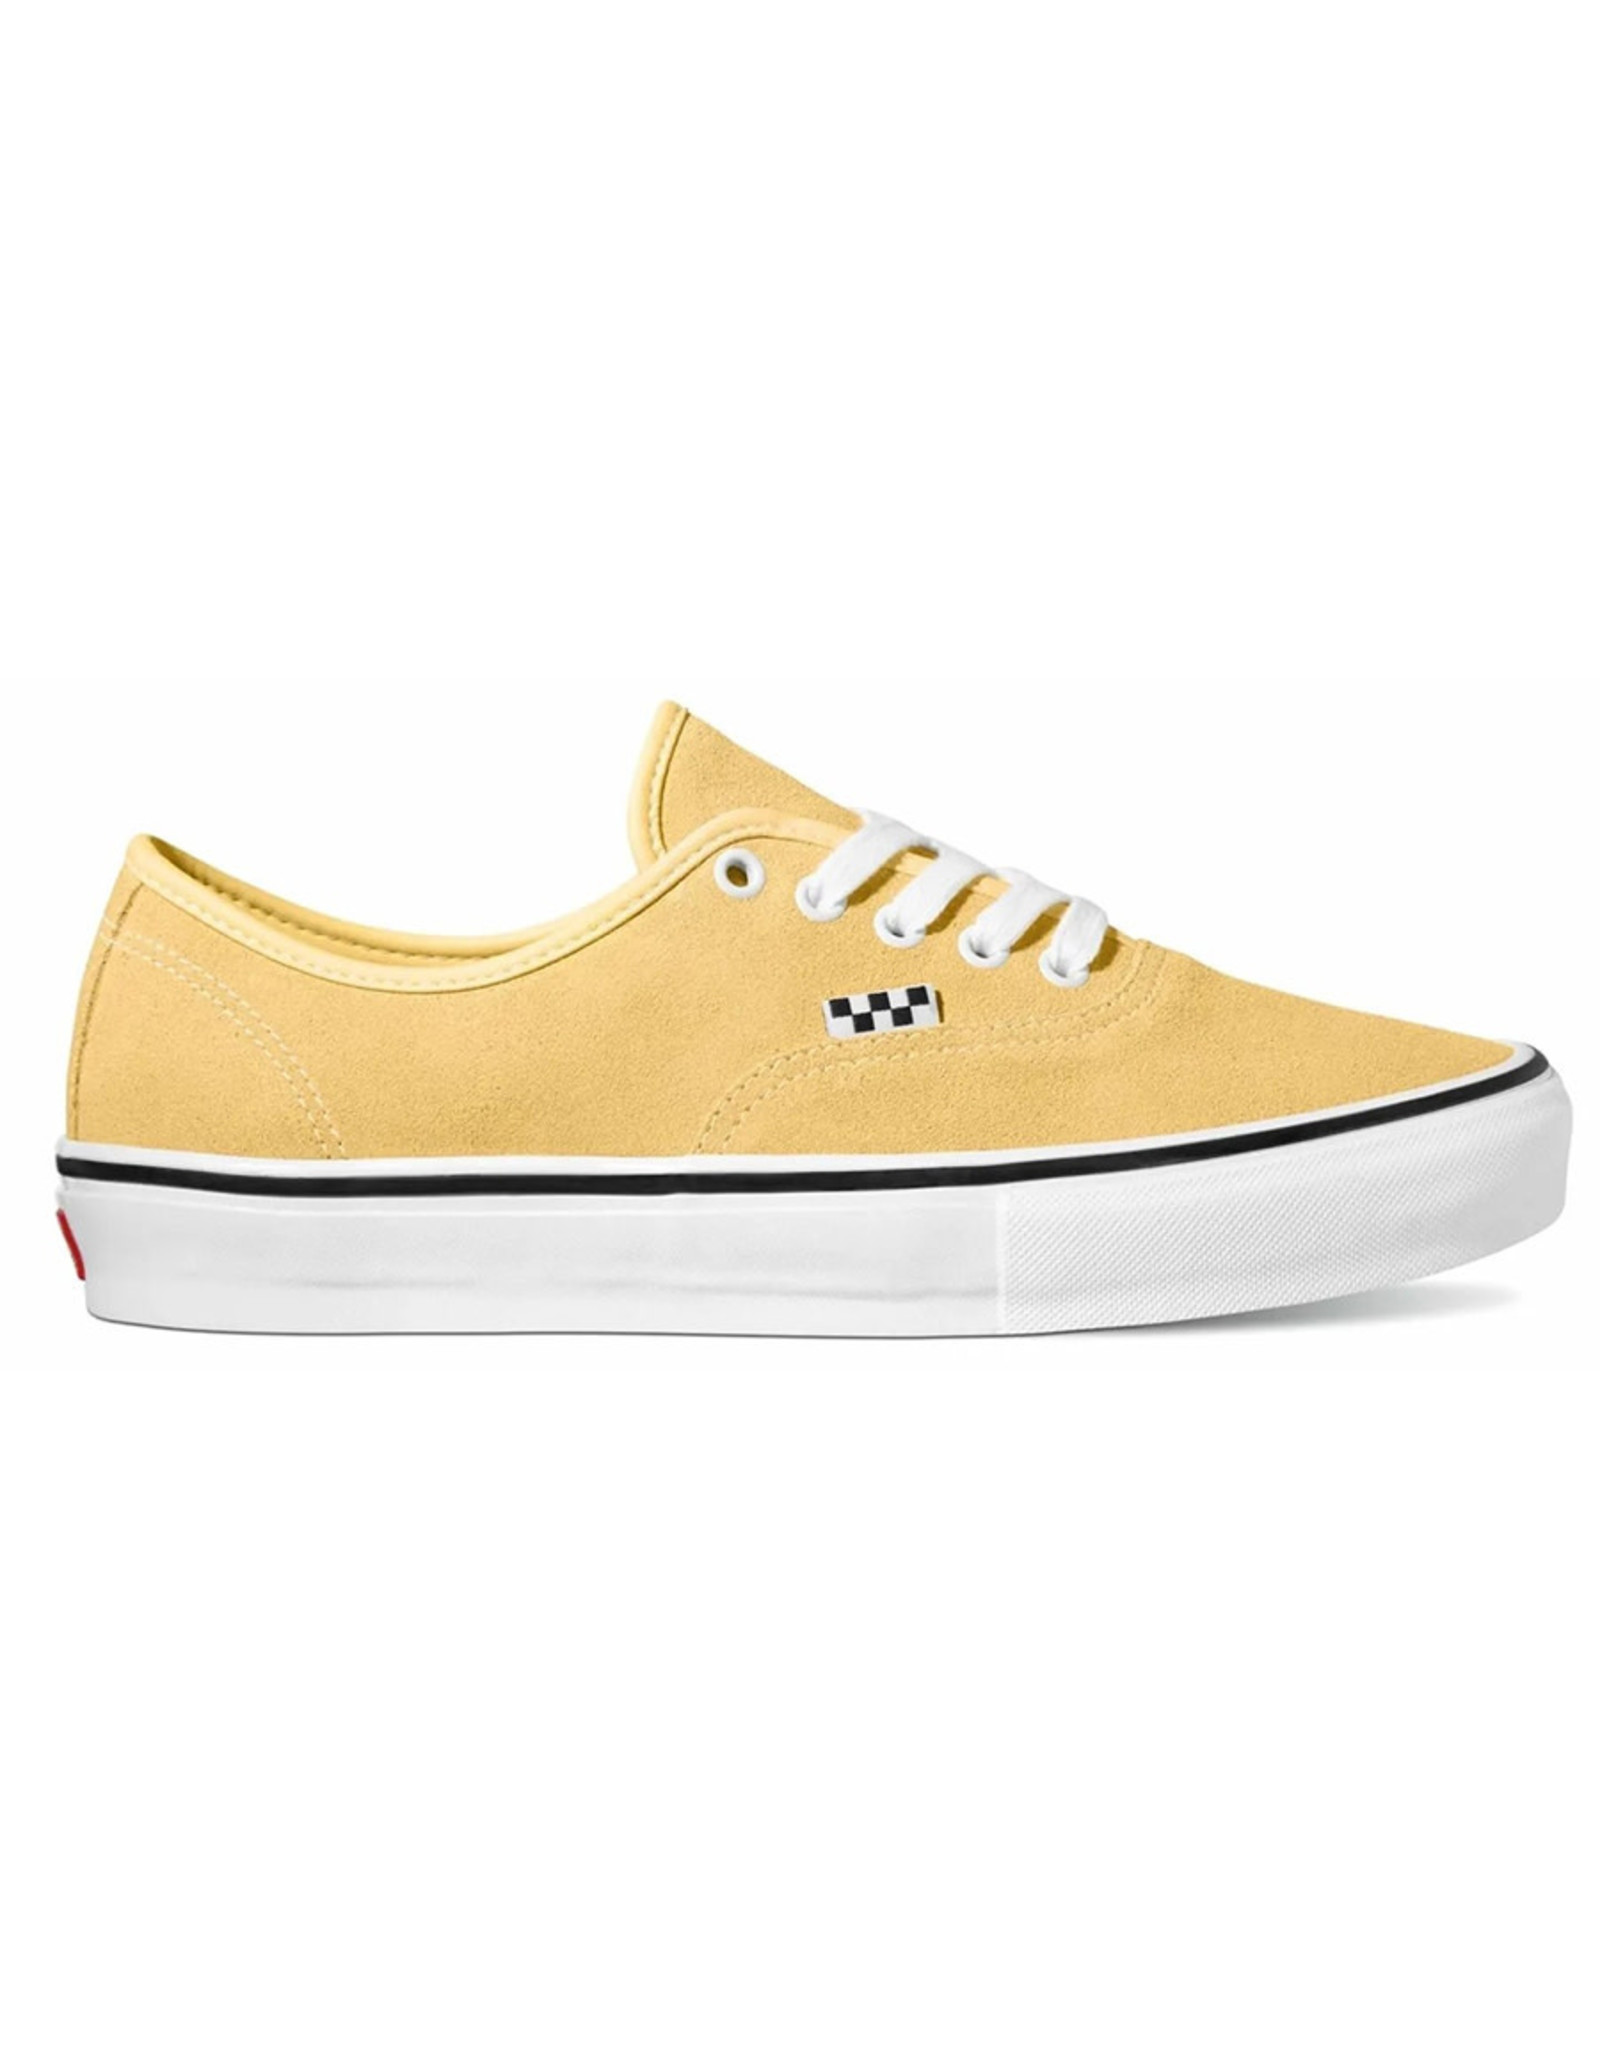 Vans Vans Shoe Skate Authentic (Banana)